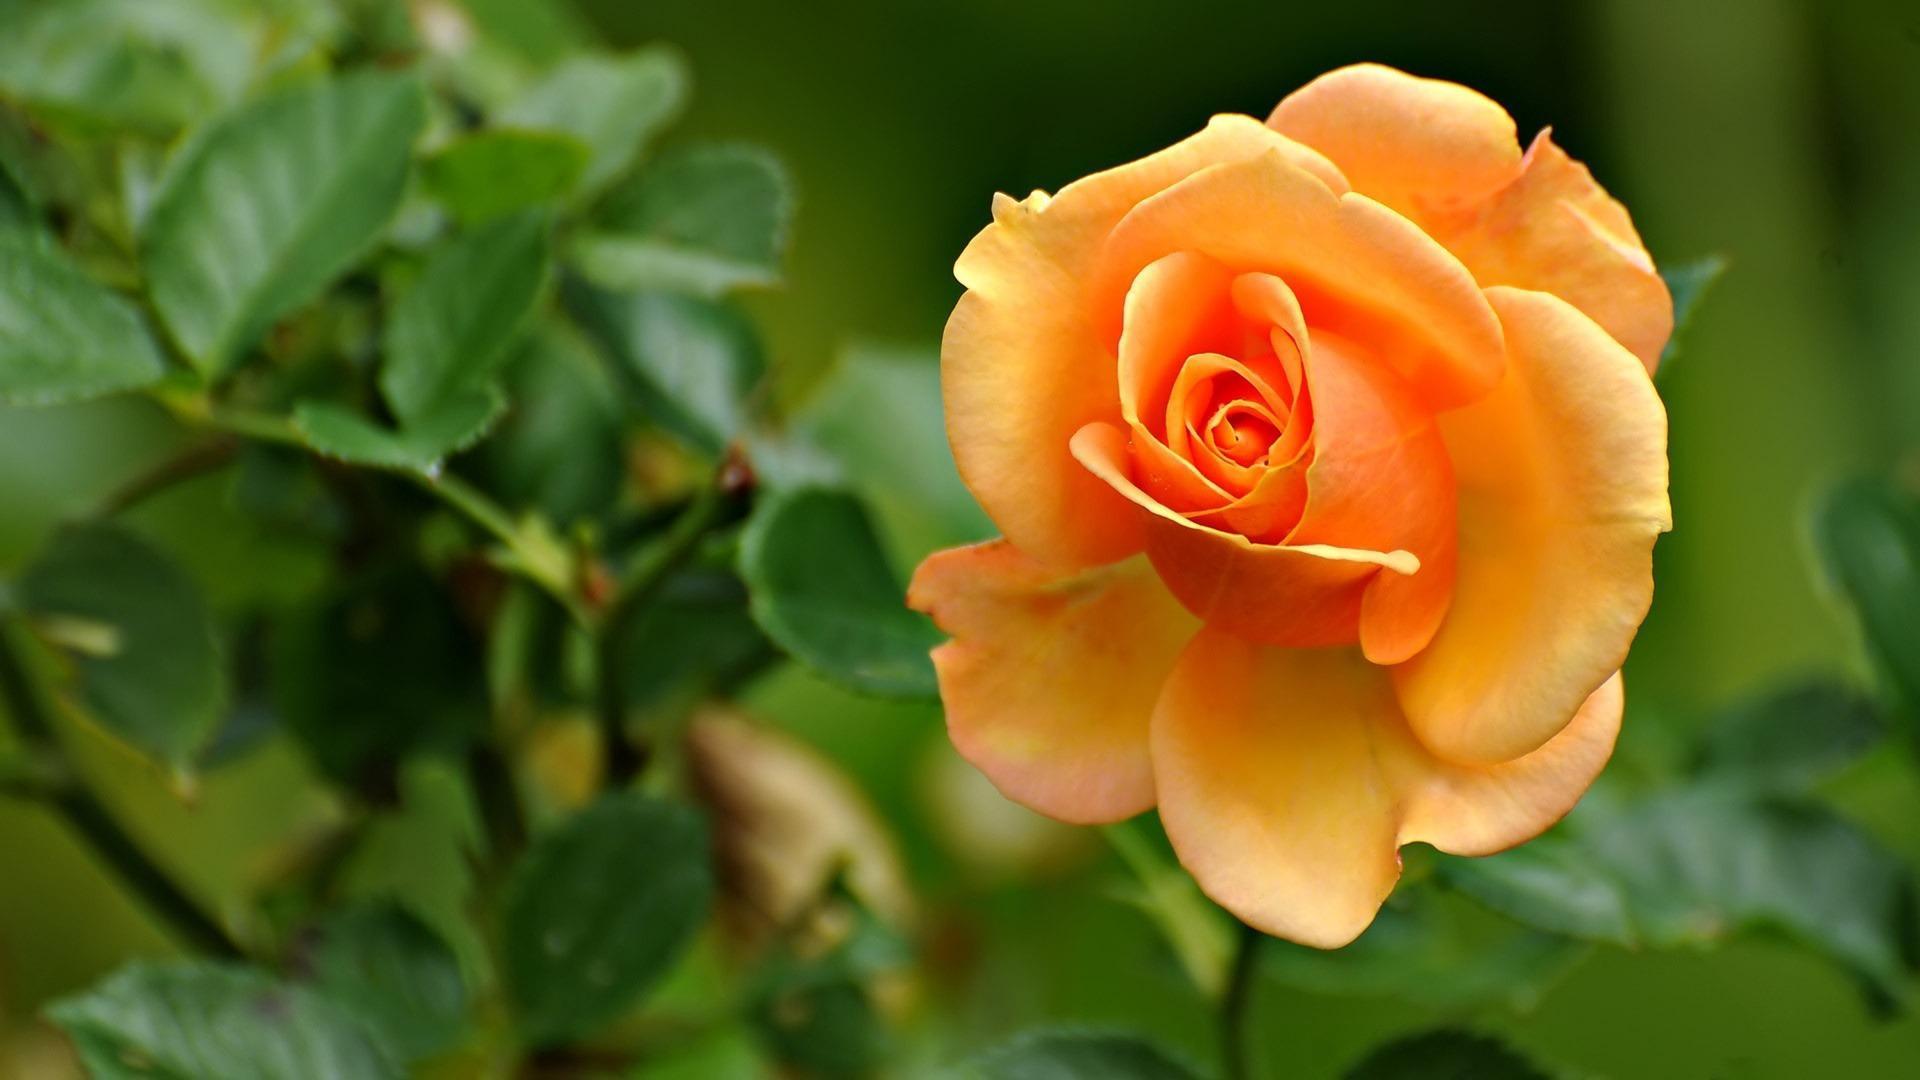 Yellow Rose Flower Wallpaper Hd Flowers Healthy